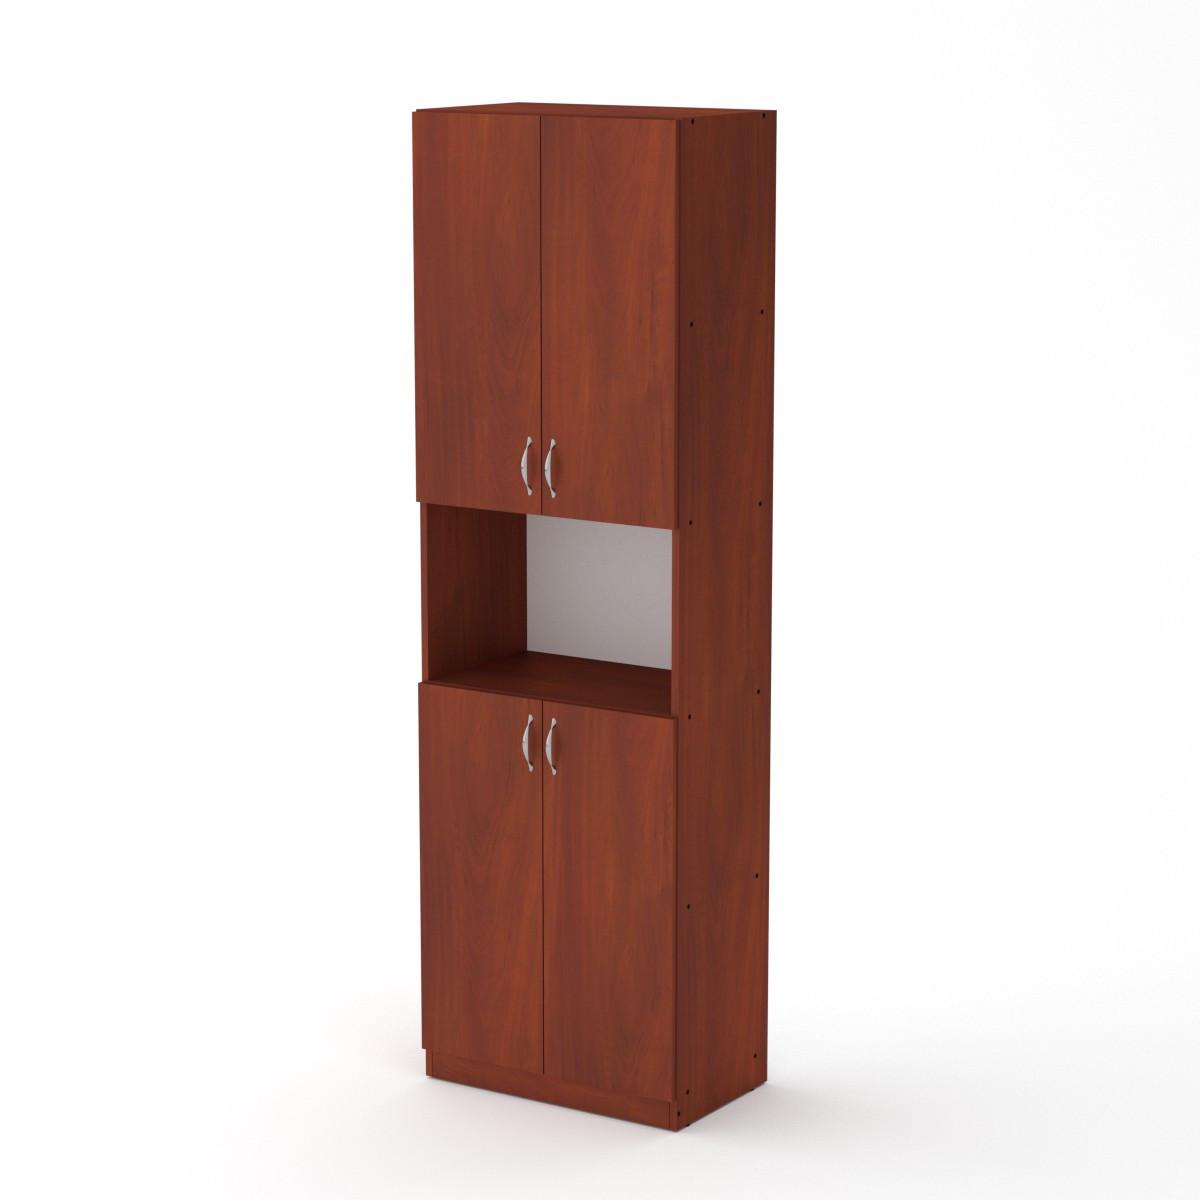 Шкаф книжный КШ-5 яблоня Компанит (60х37х195 см)